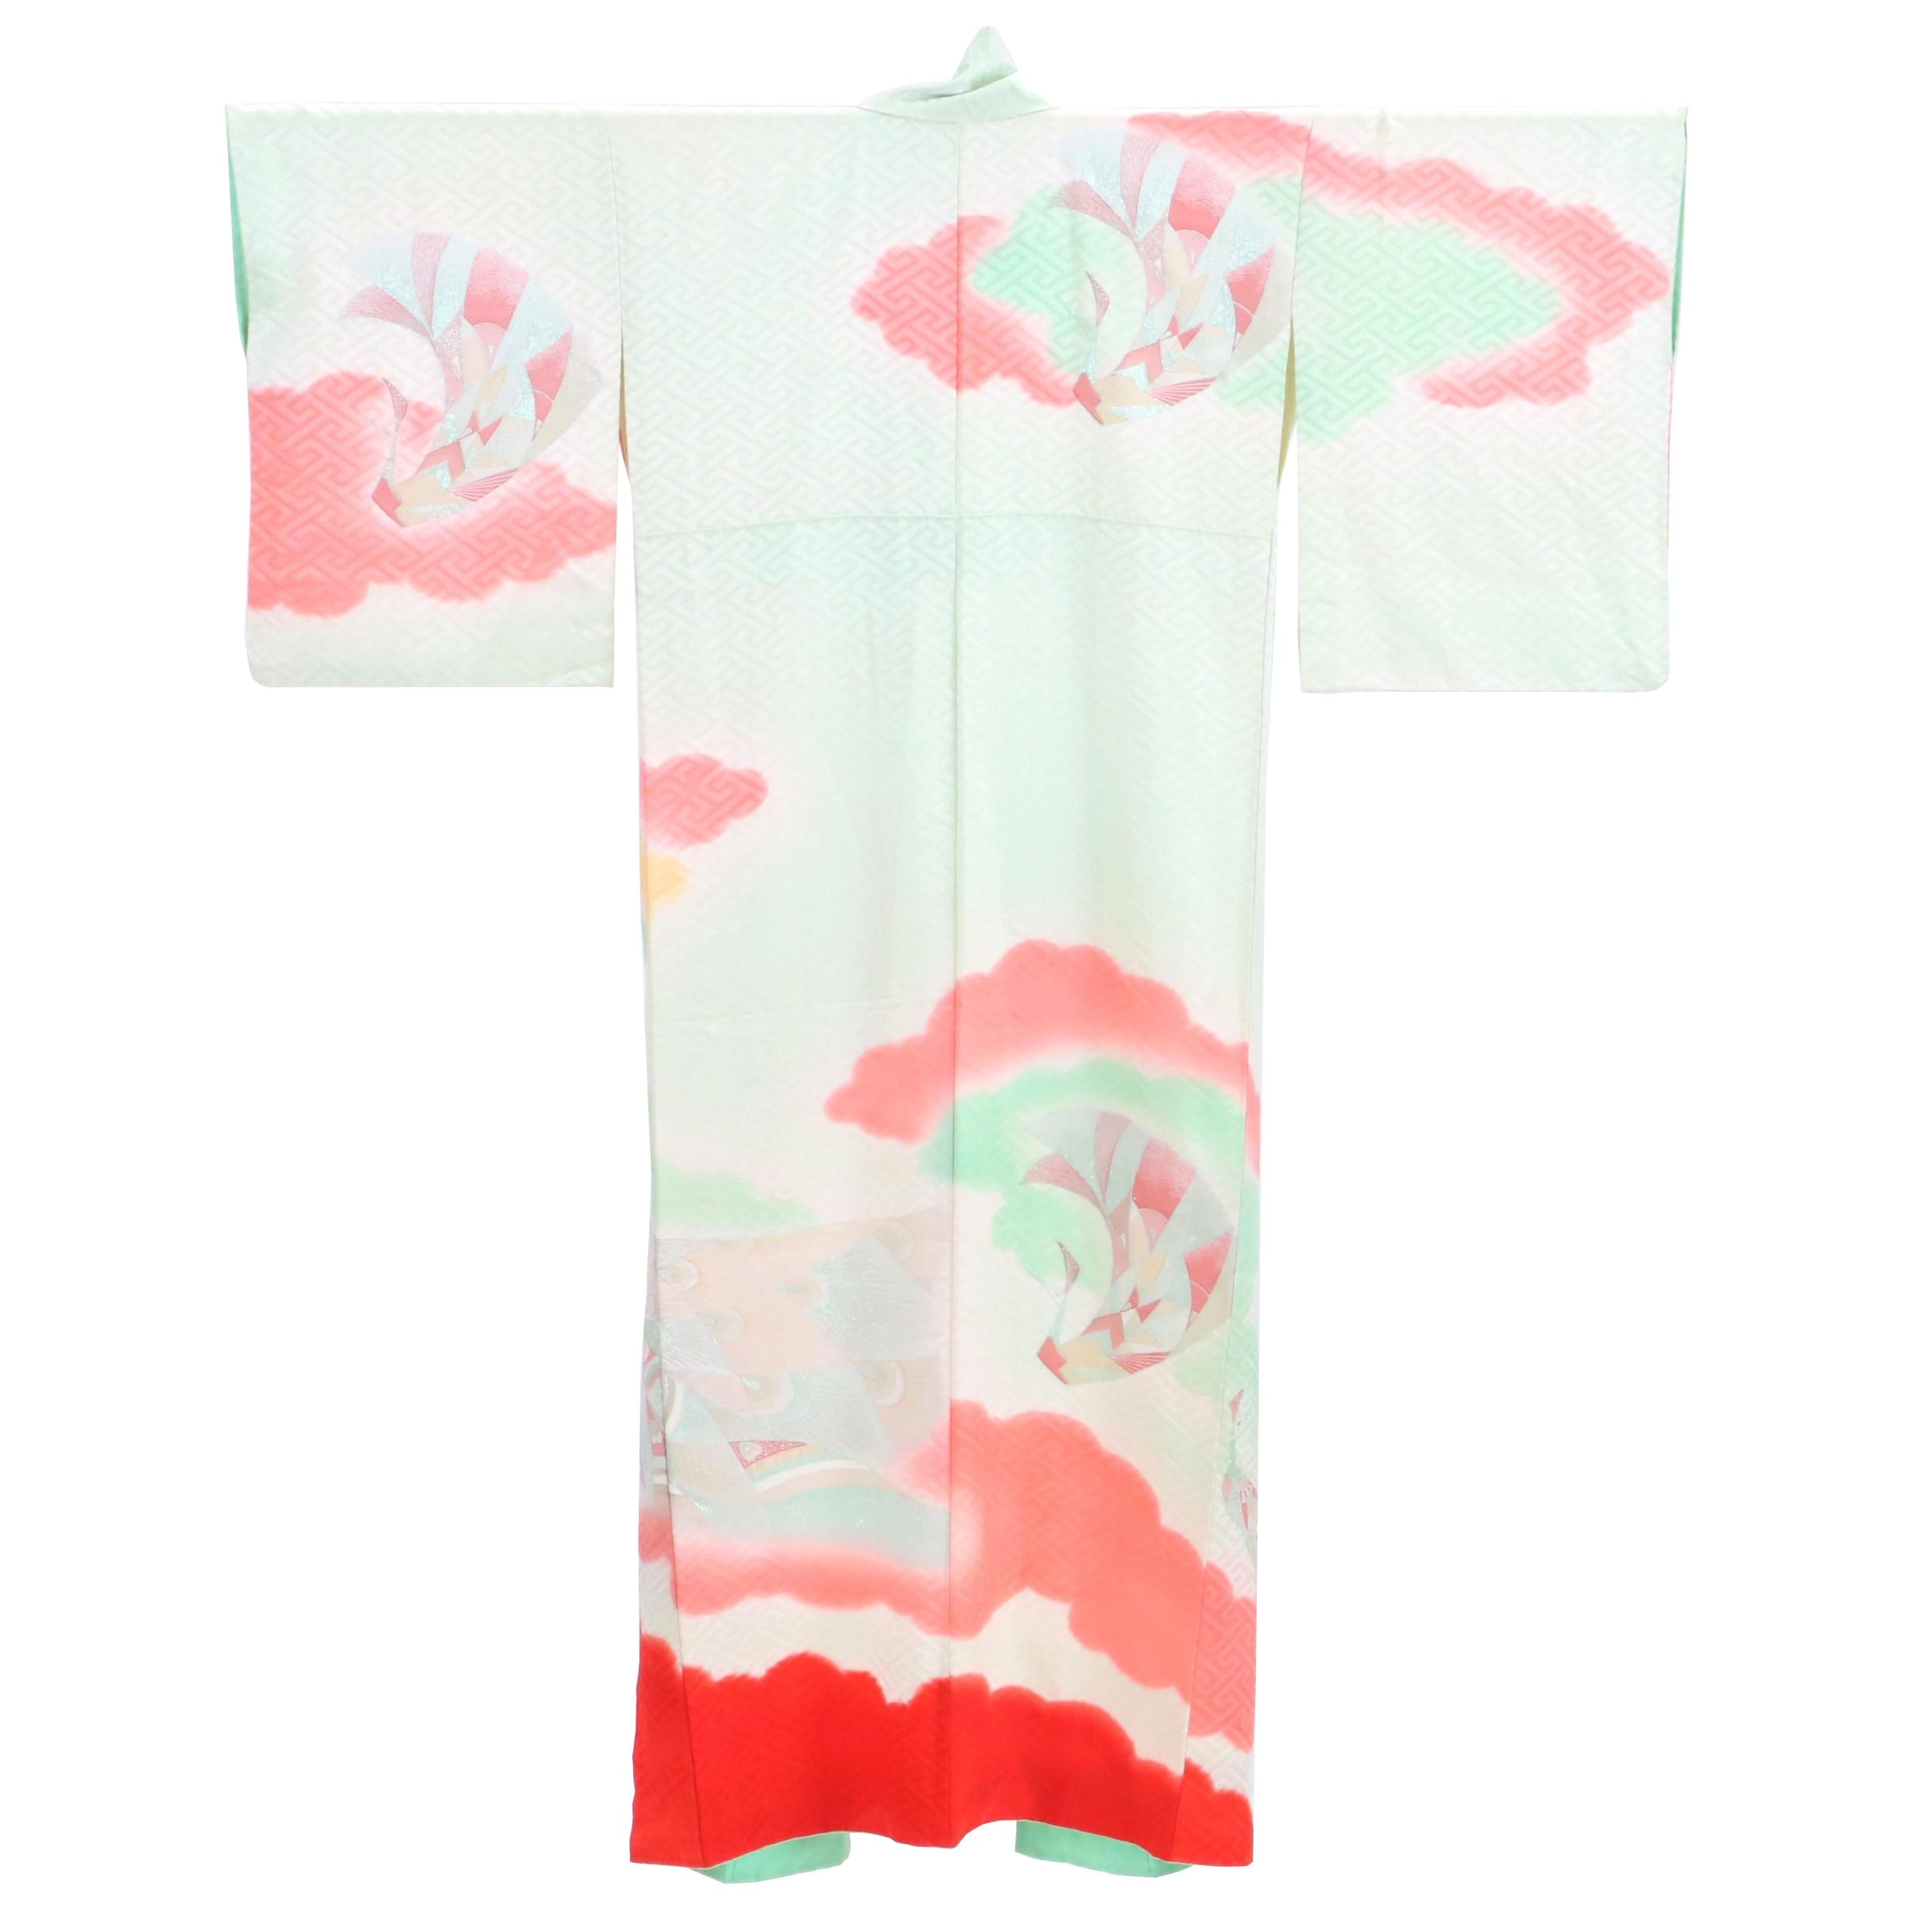 Circa 1960s Vintage Japanese Silk Damask Kimono